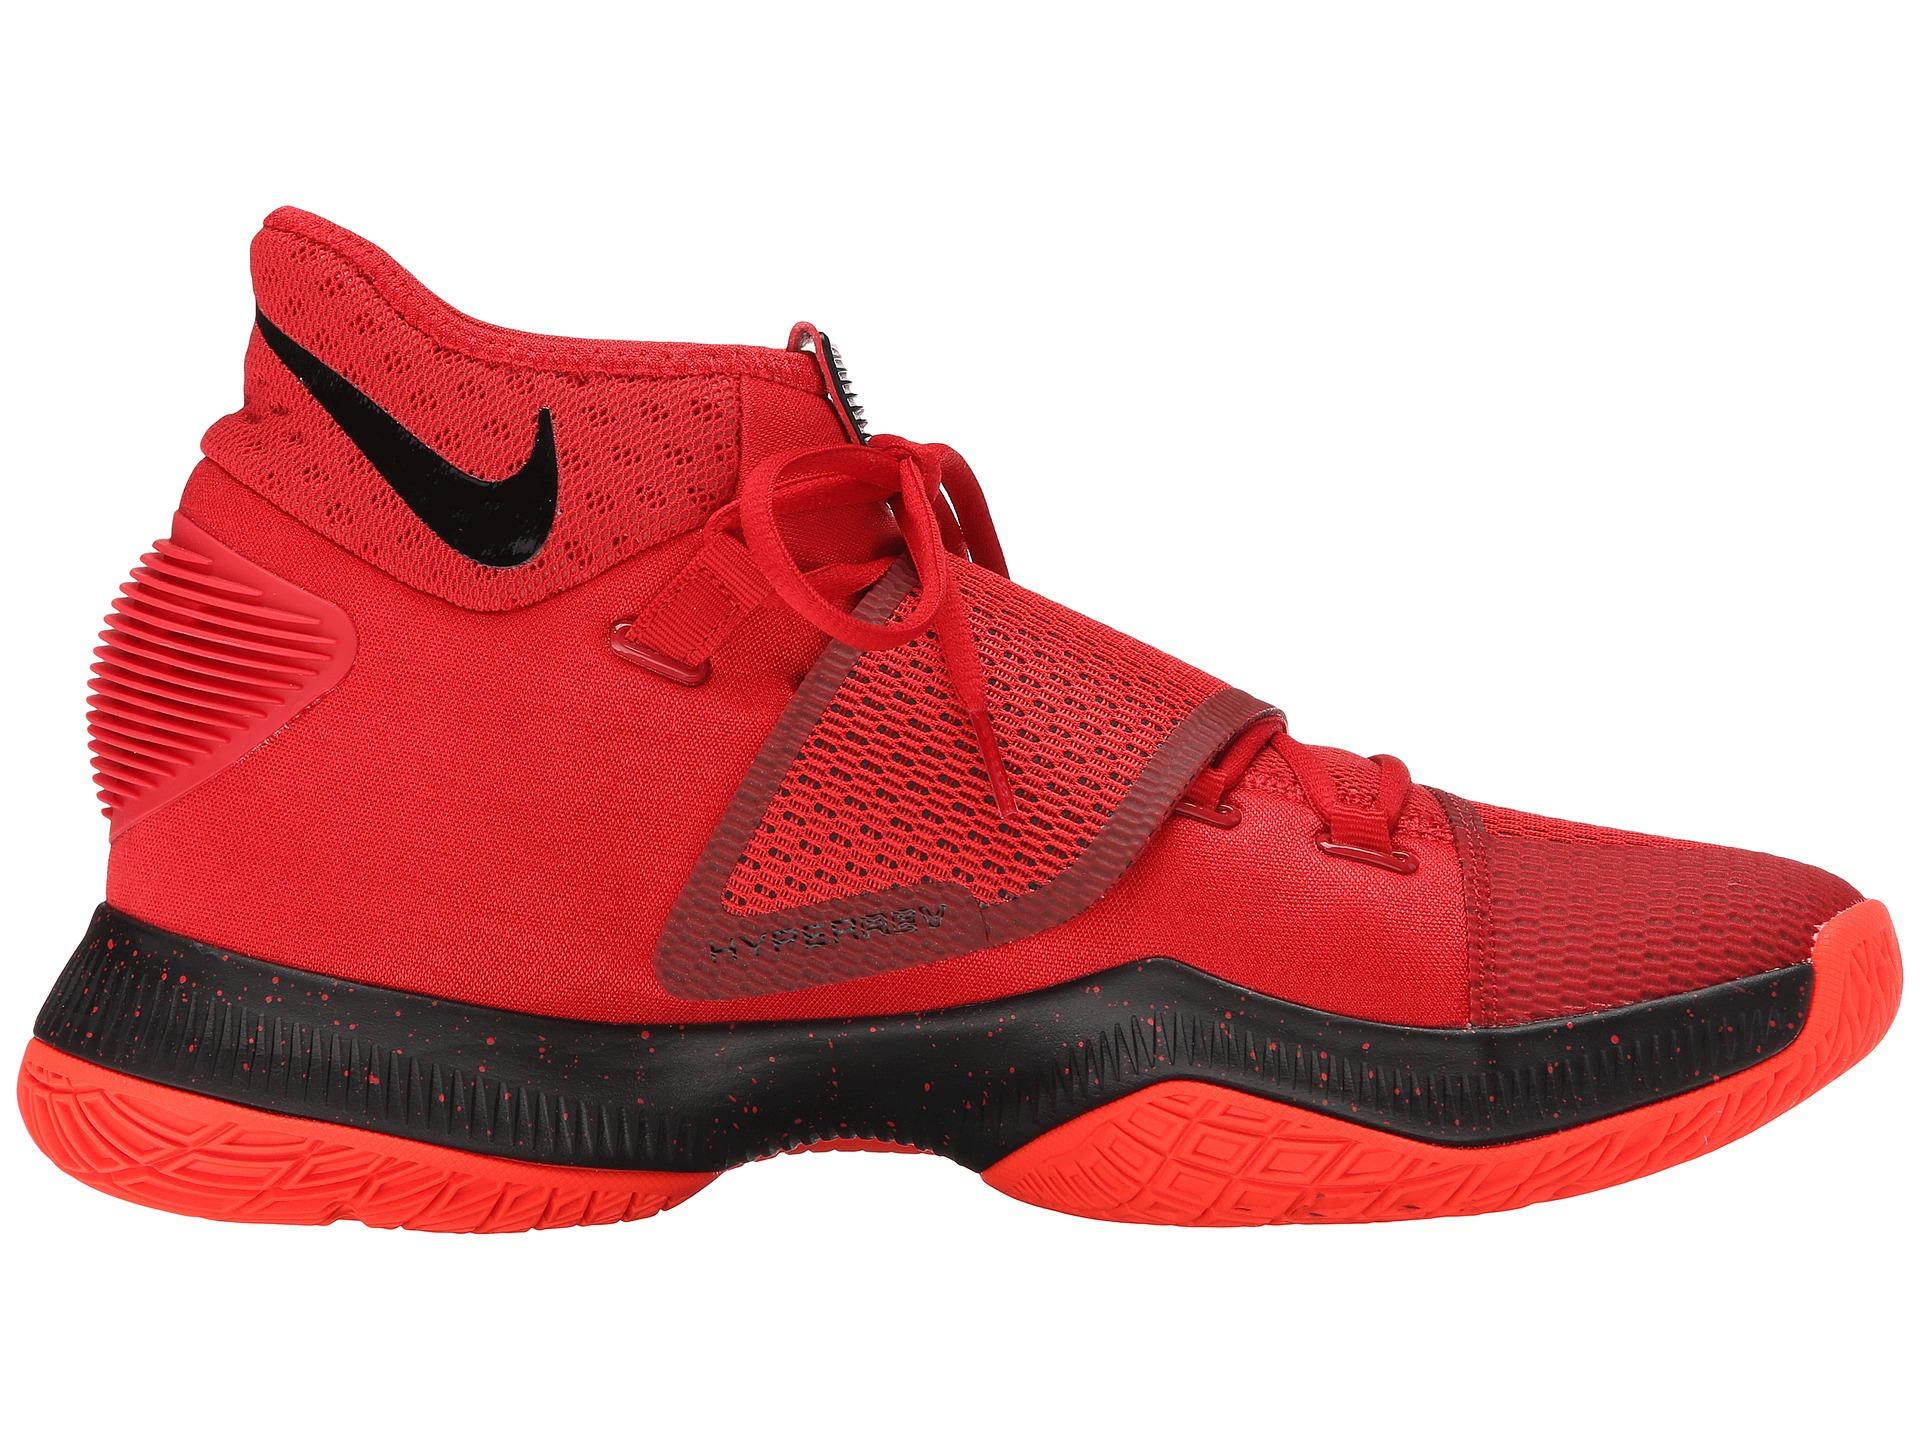 451d3265538 Lyst - Nike Zoom Hyperrev 2016 in Red for Men